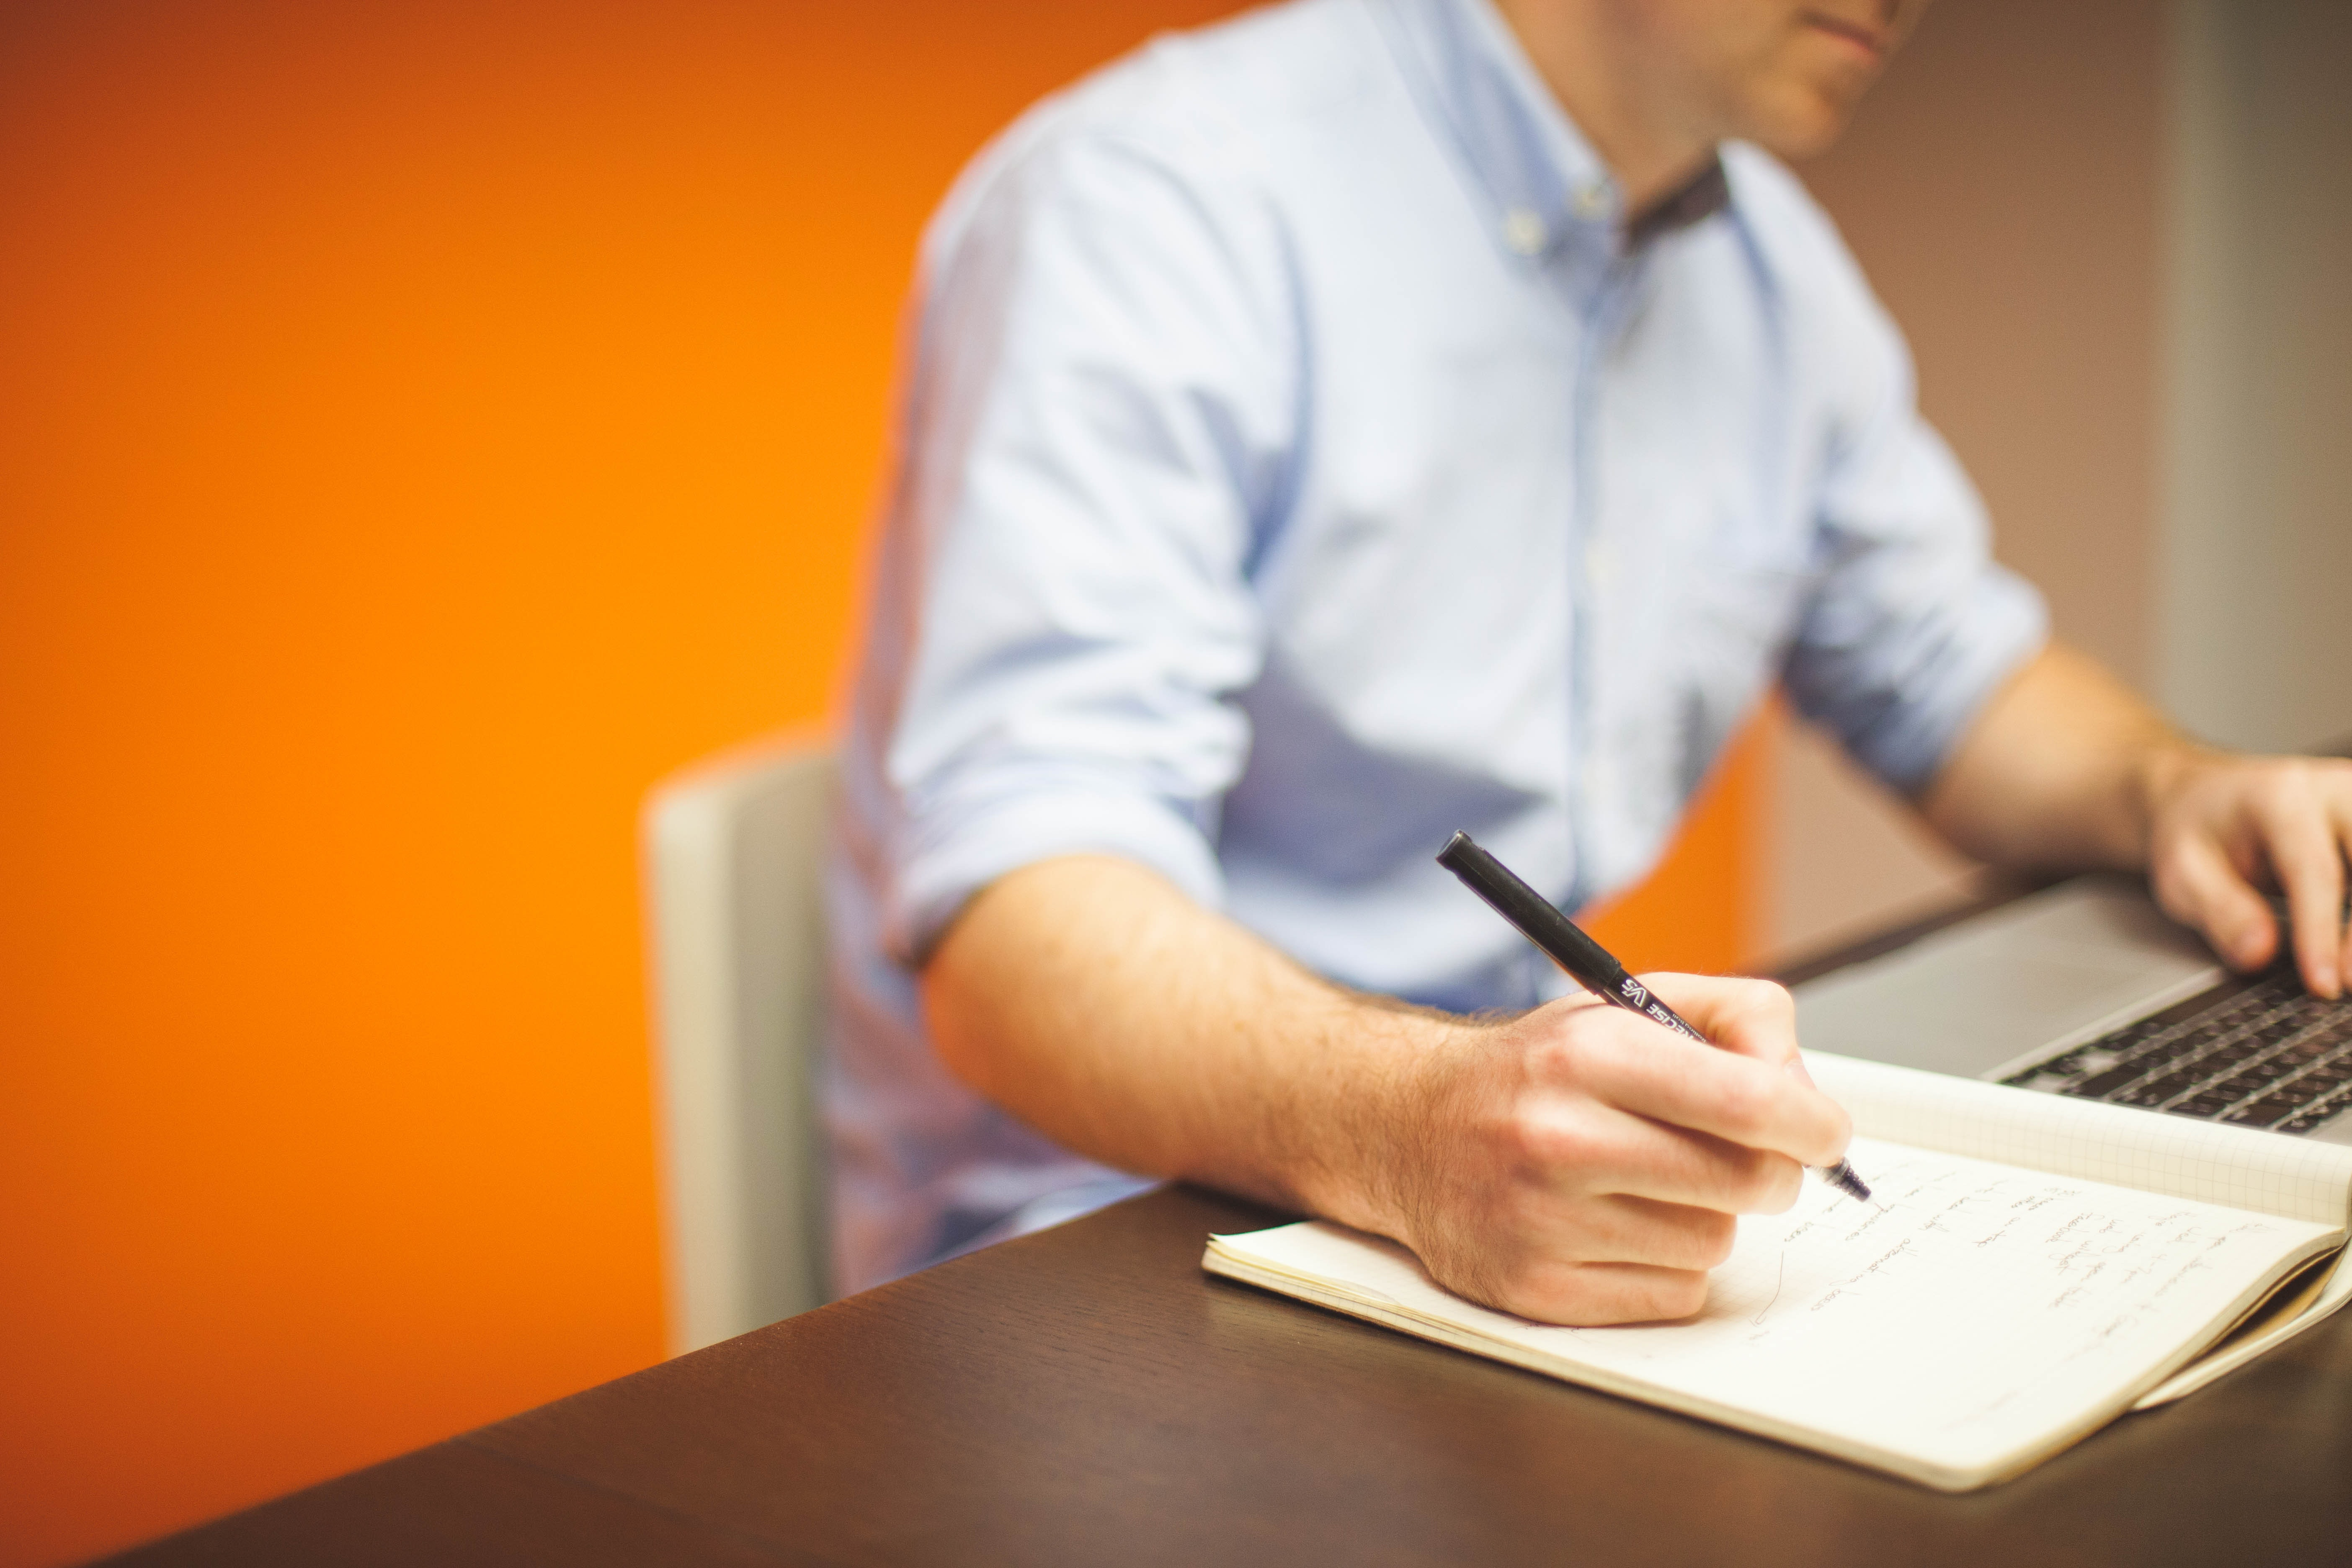 businessman-broker-ce credits-continuing education-writing